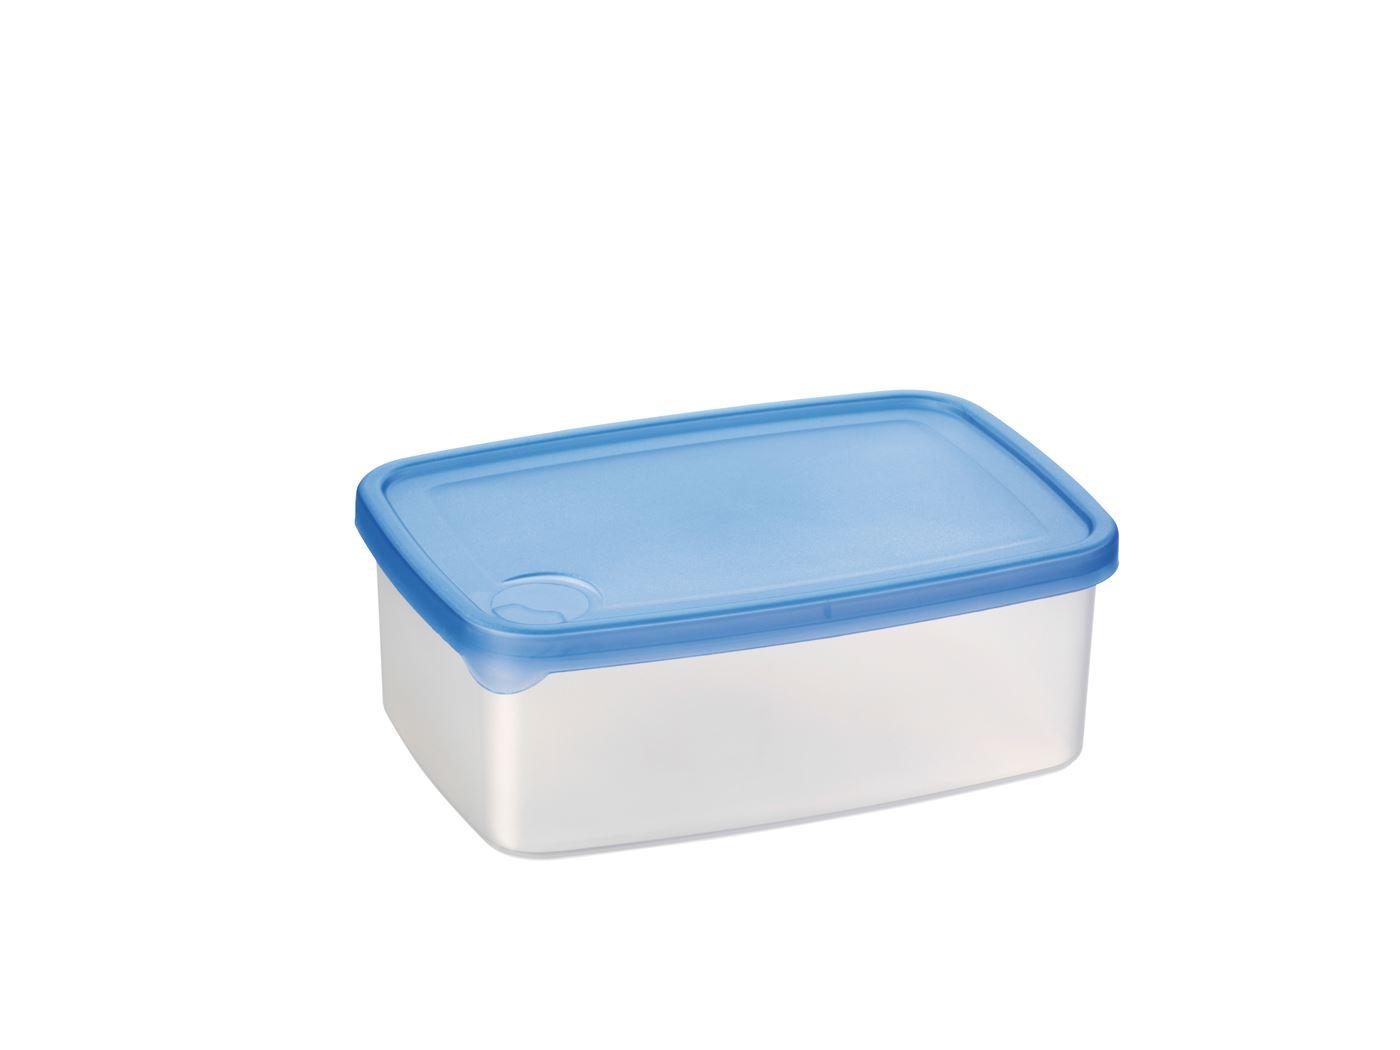 sunware-club-cuisine-voorraaddoos-transparanttransparant-blauw